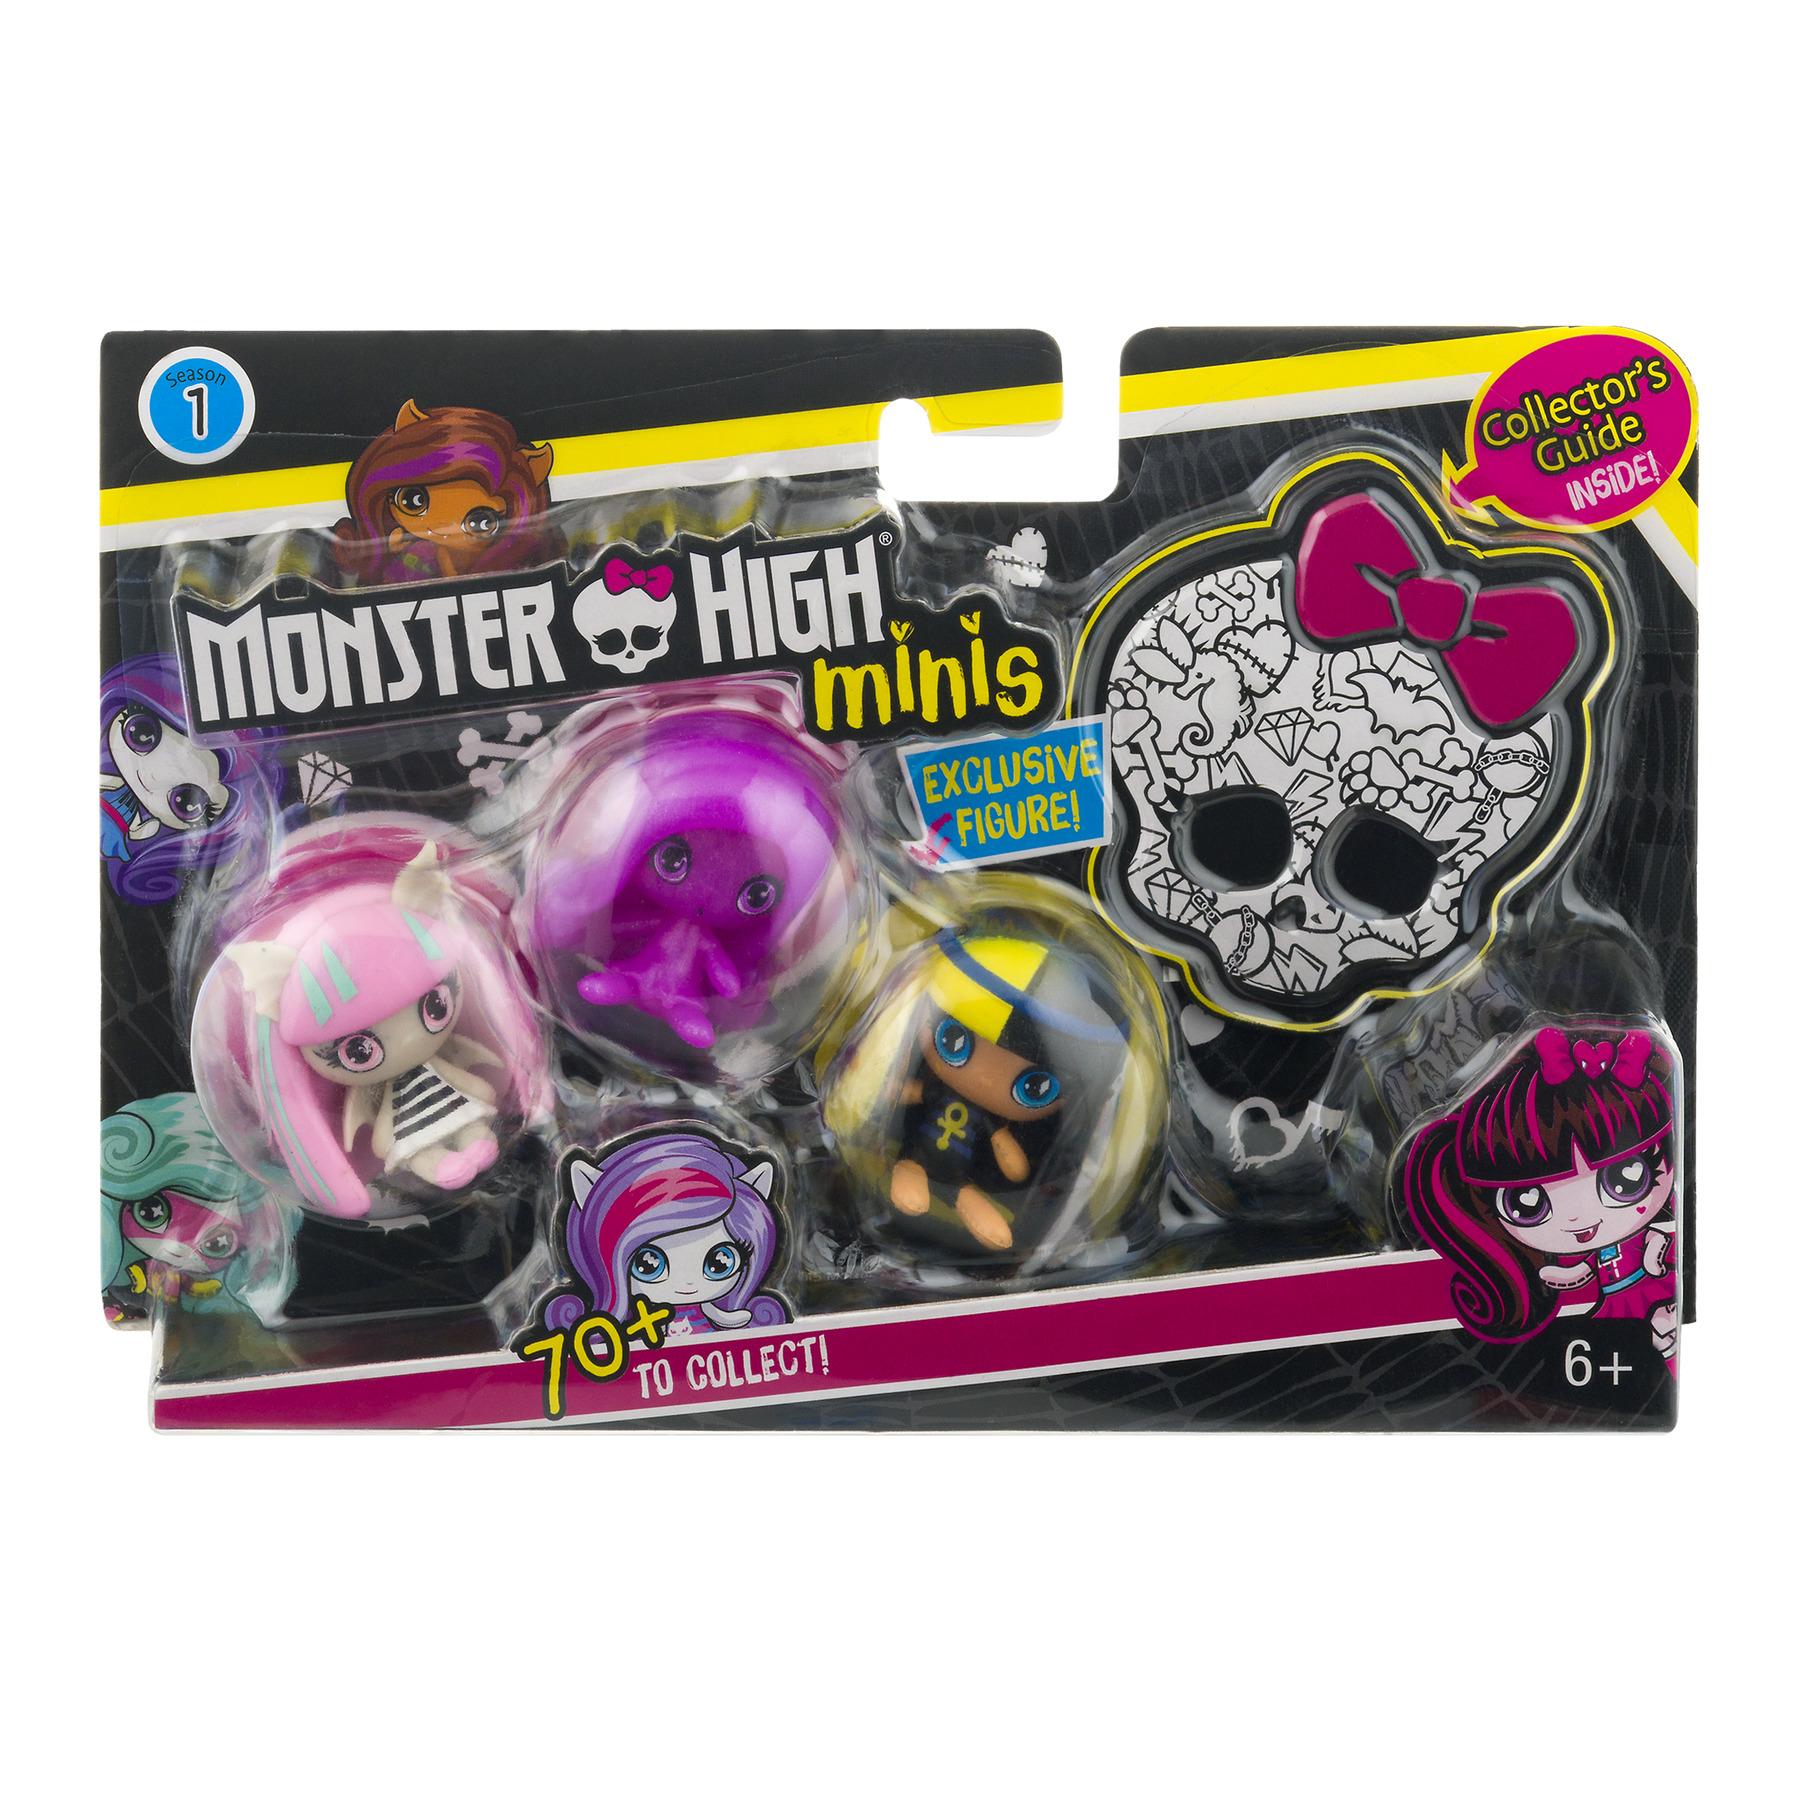 Monster High Minis Figure (3 Pack) by Mattel